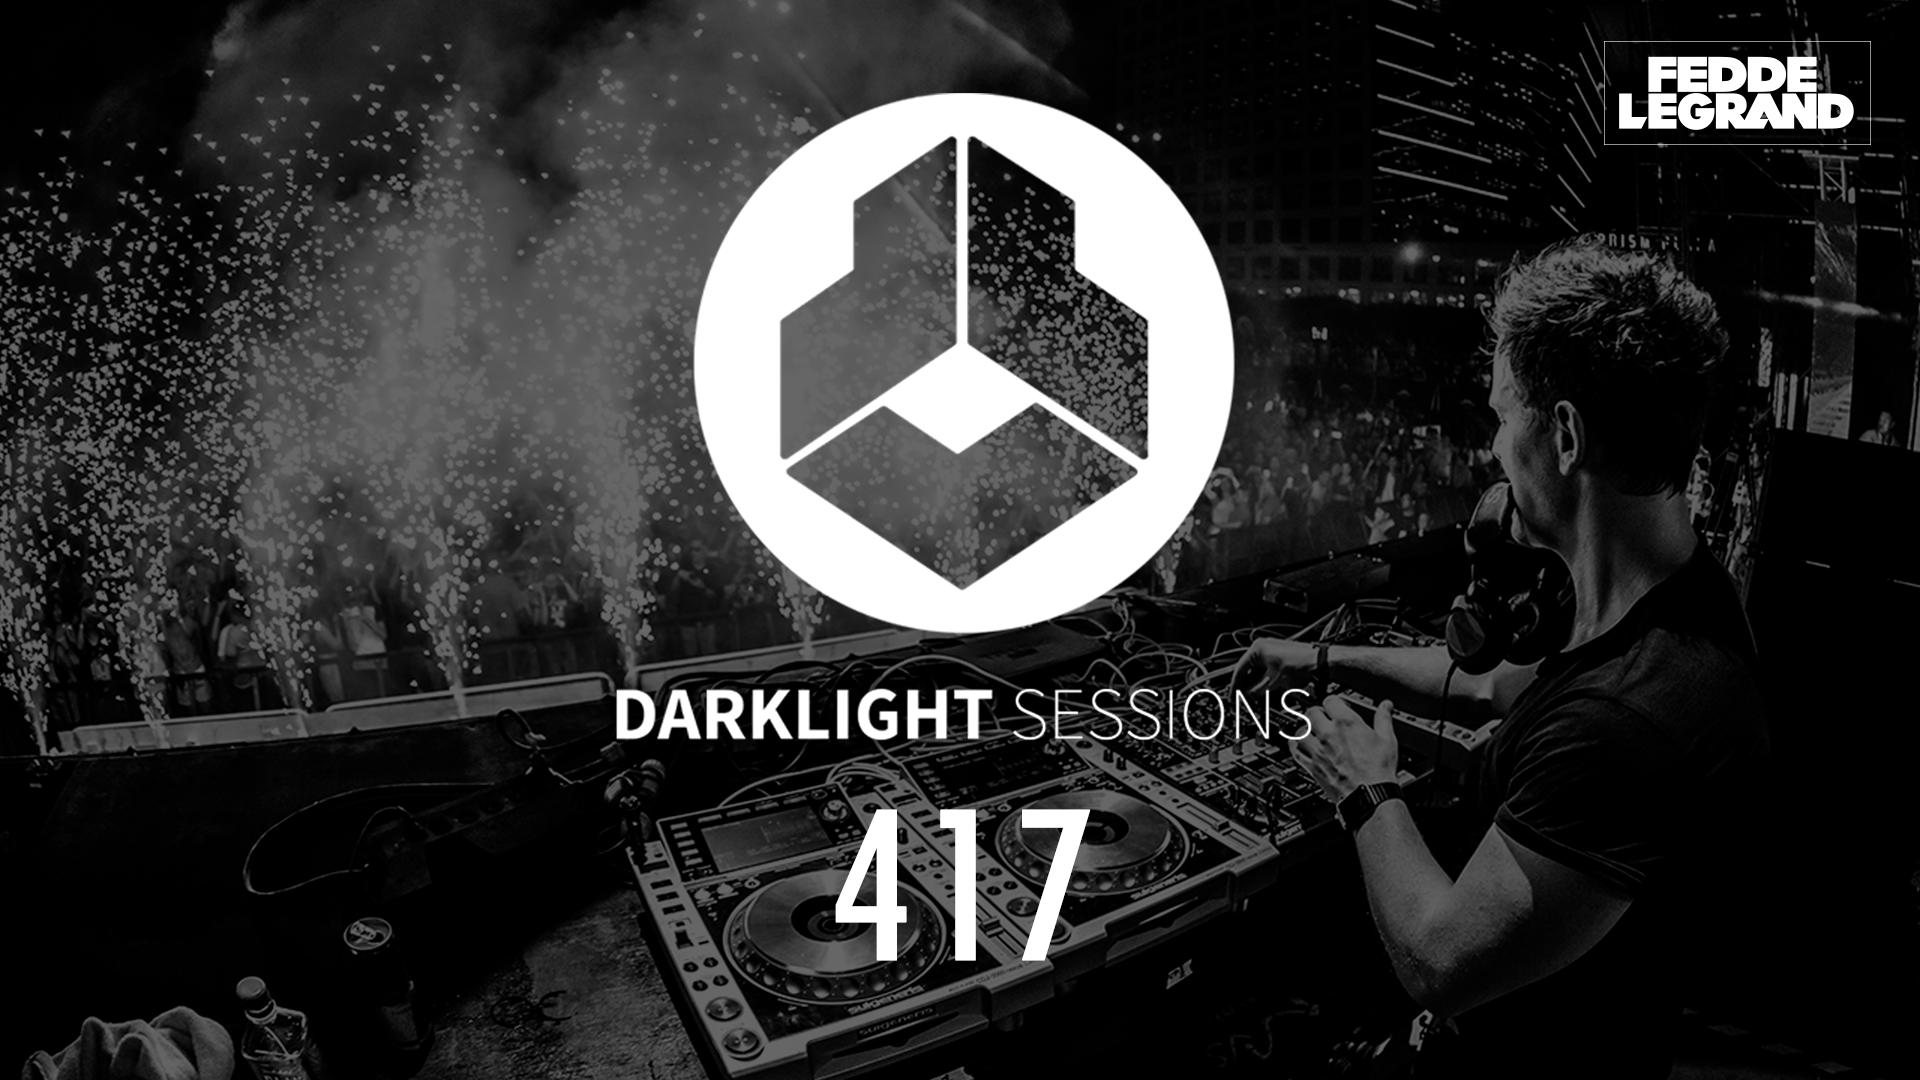 Darklight Sessions 417